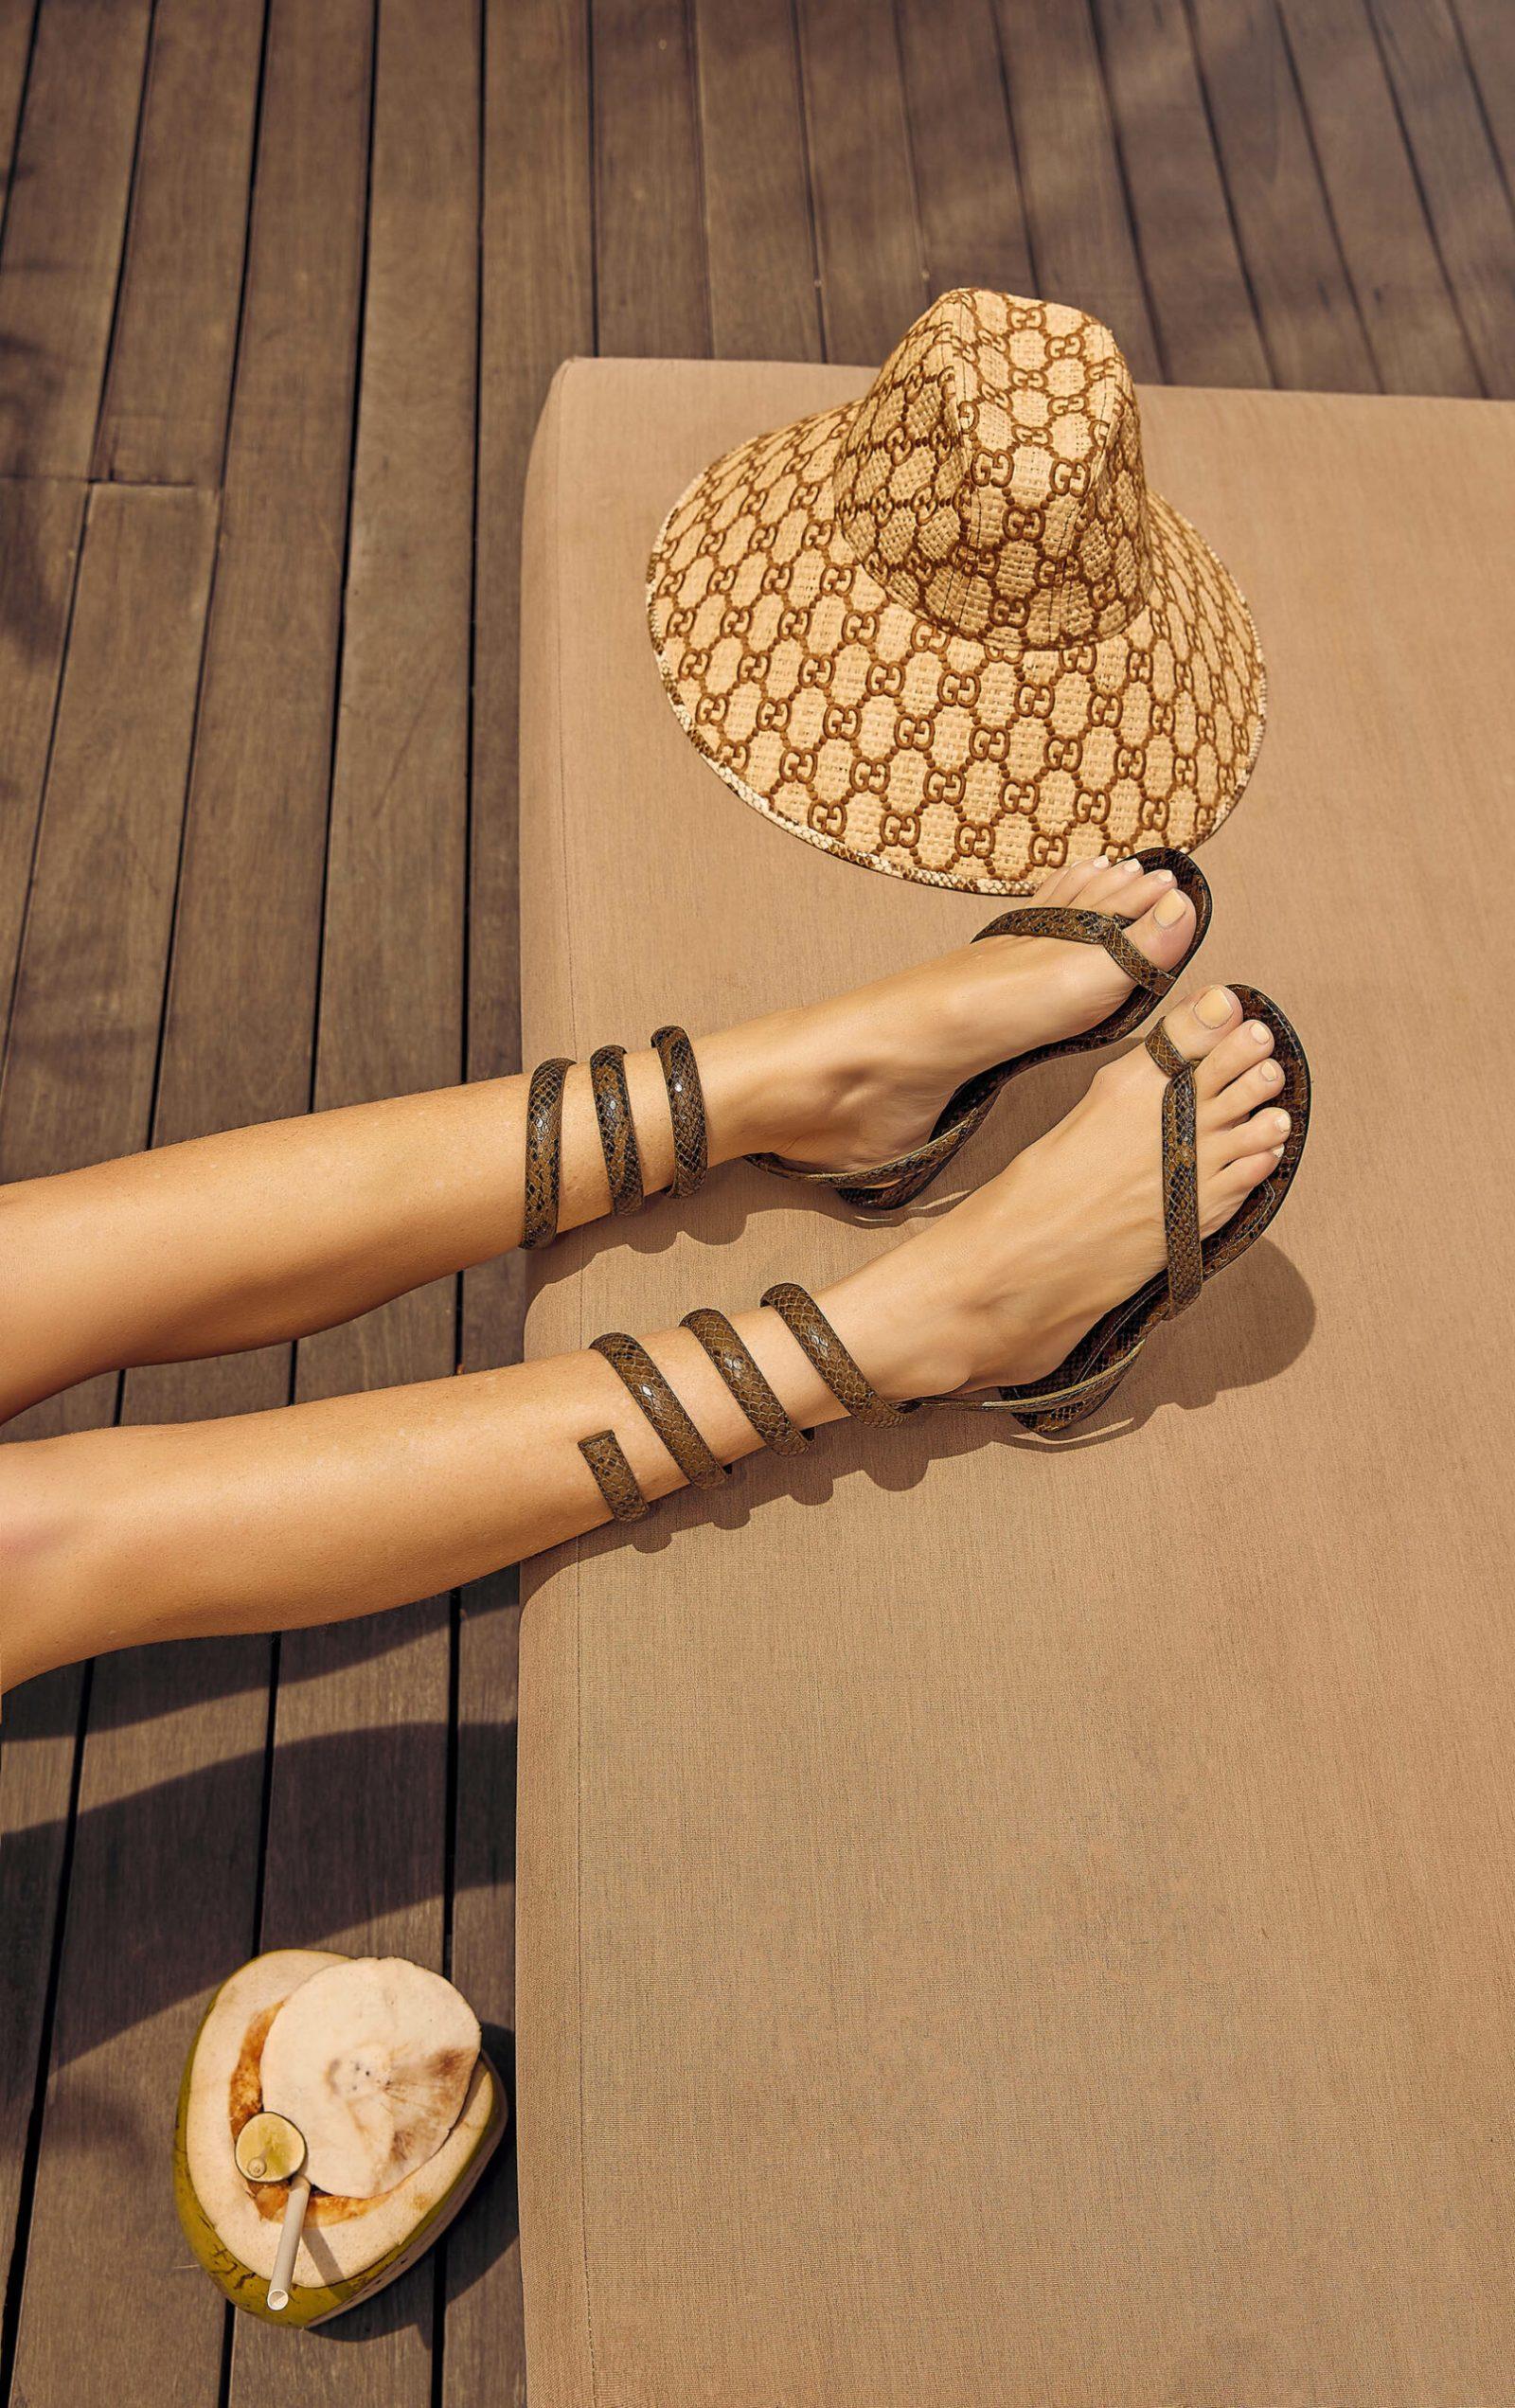 Gucci-Straw-Hat-Bottega-Veneta-Wrap-Sandals-Amanda-Shadforth-scaled